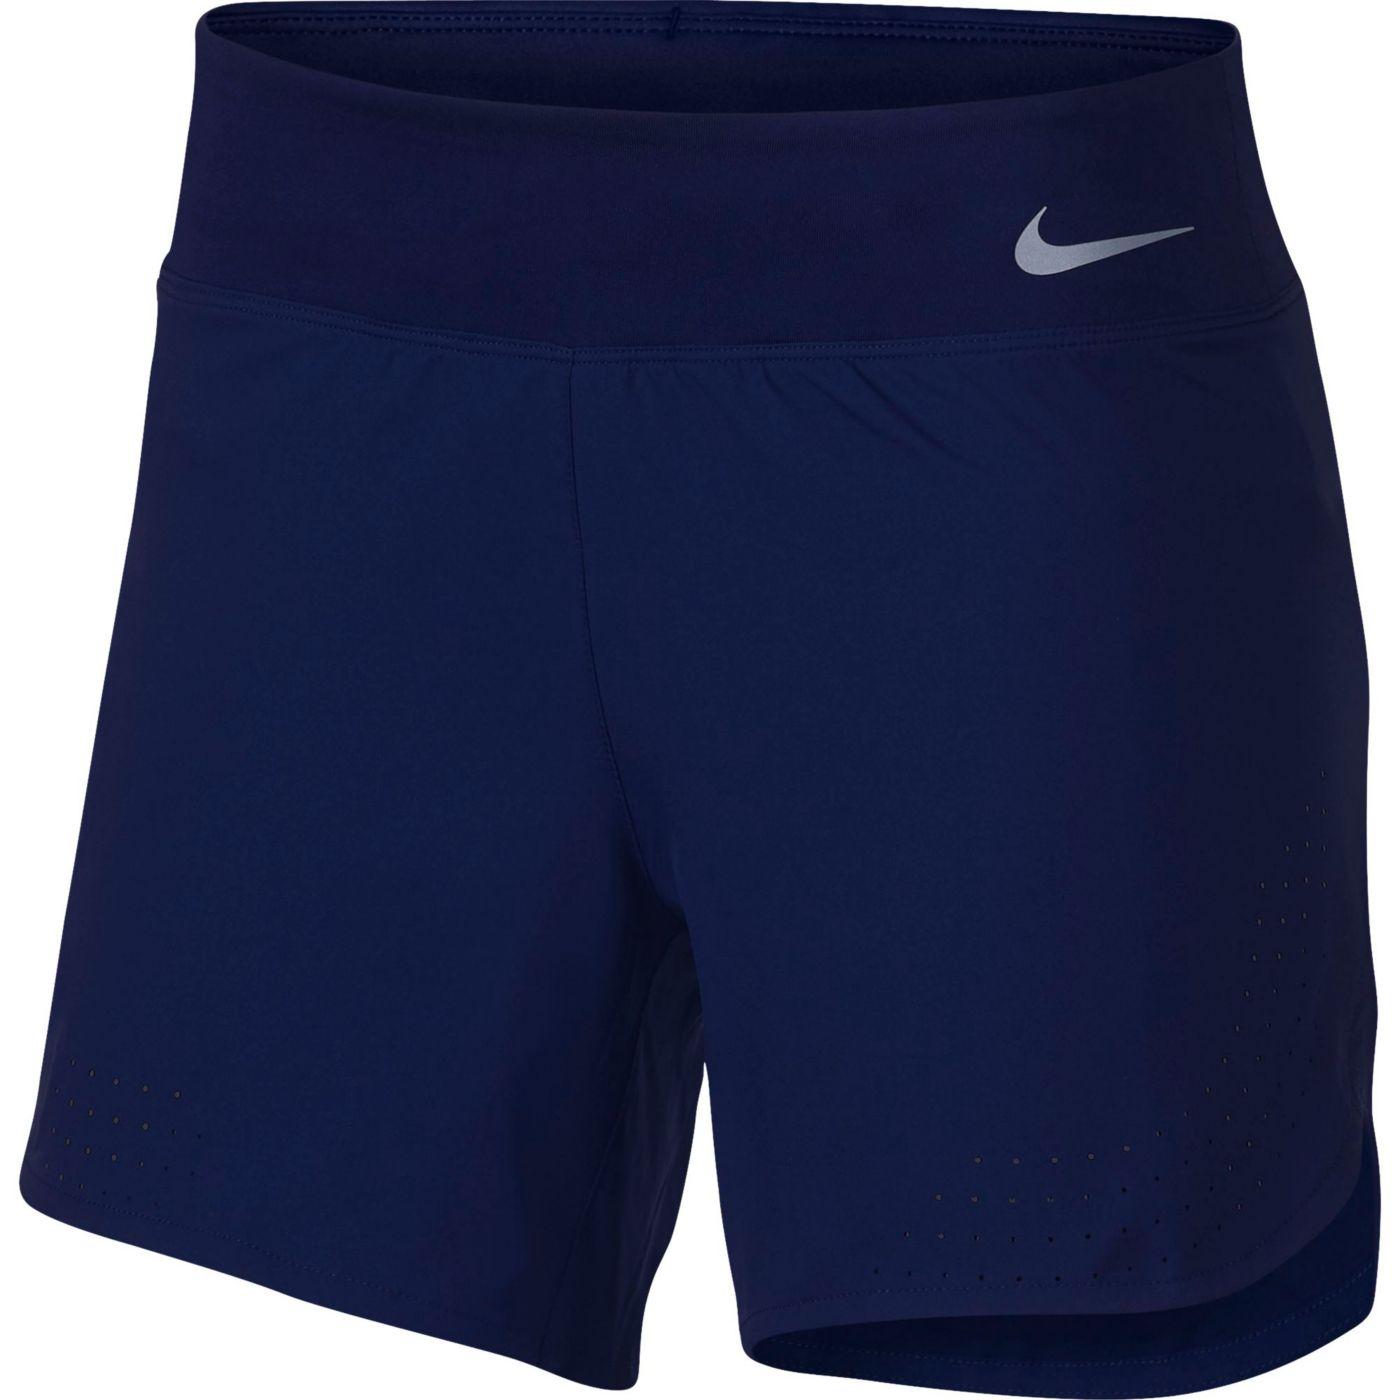 "Nike Women's 5"" Eclipse Running Shorts"